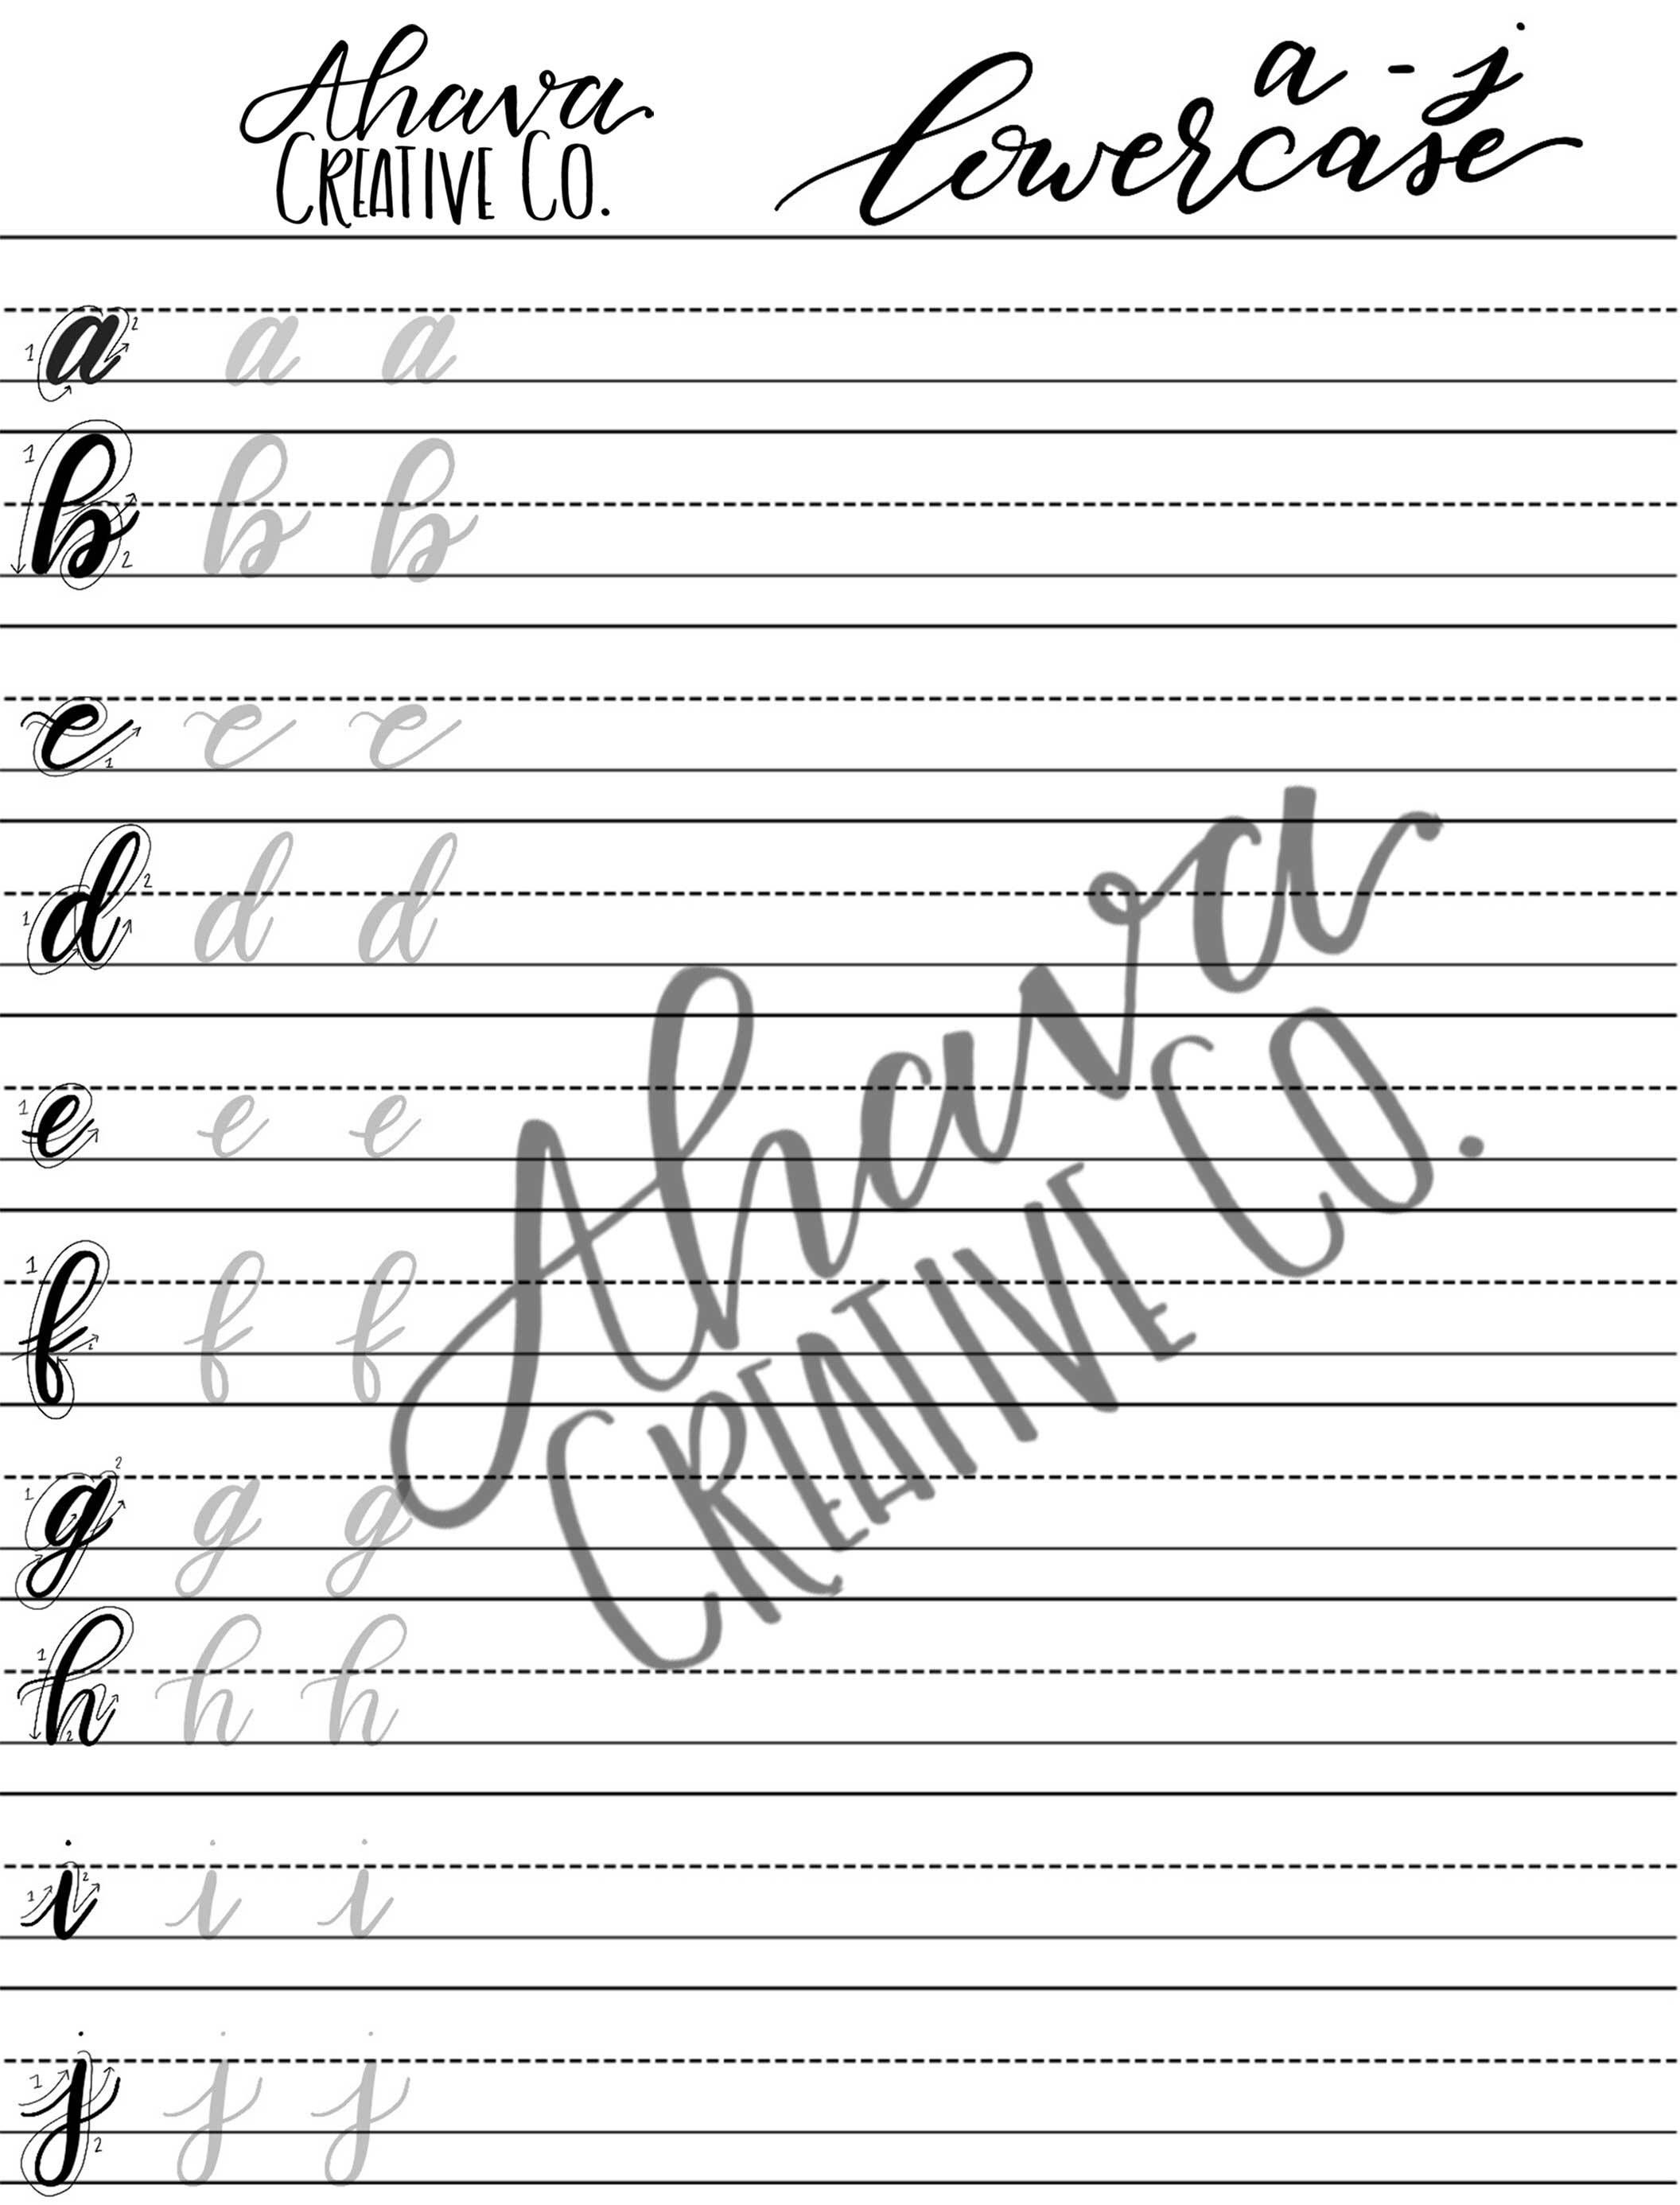 Practice Sheets For Hand Lettering Brush Pen Lettering